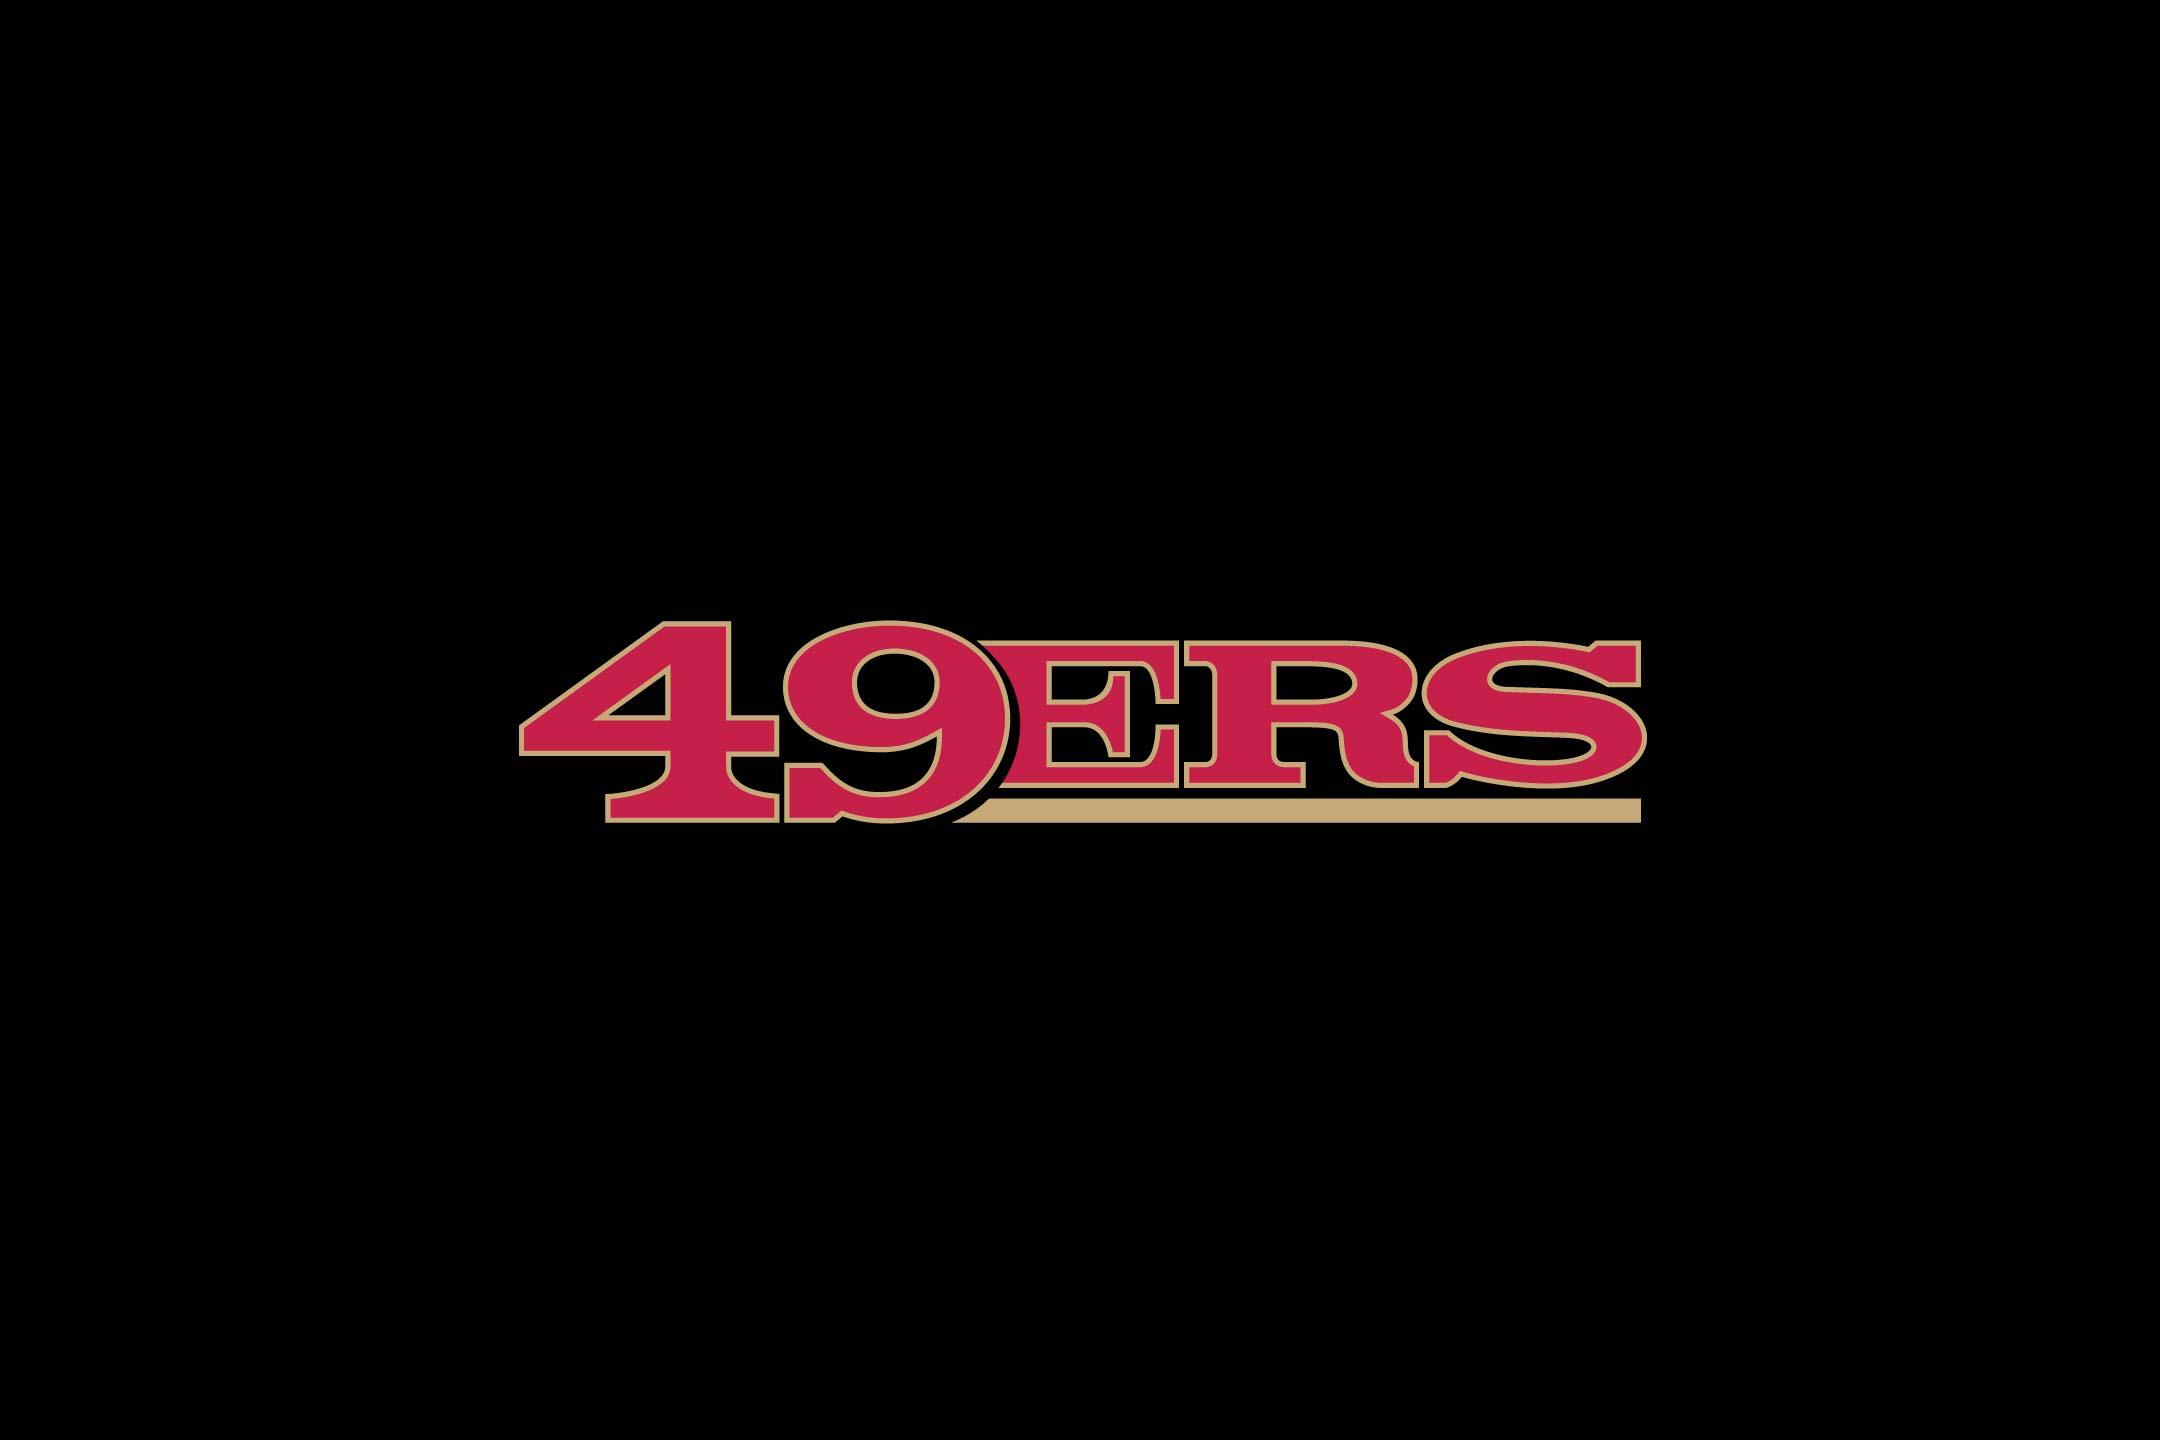 SAN FRANCISCO 49ers nfl football f wallpaper 2160x1440 154179 2160x1440